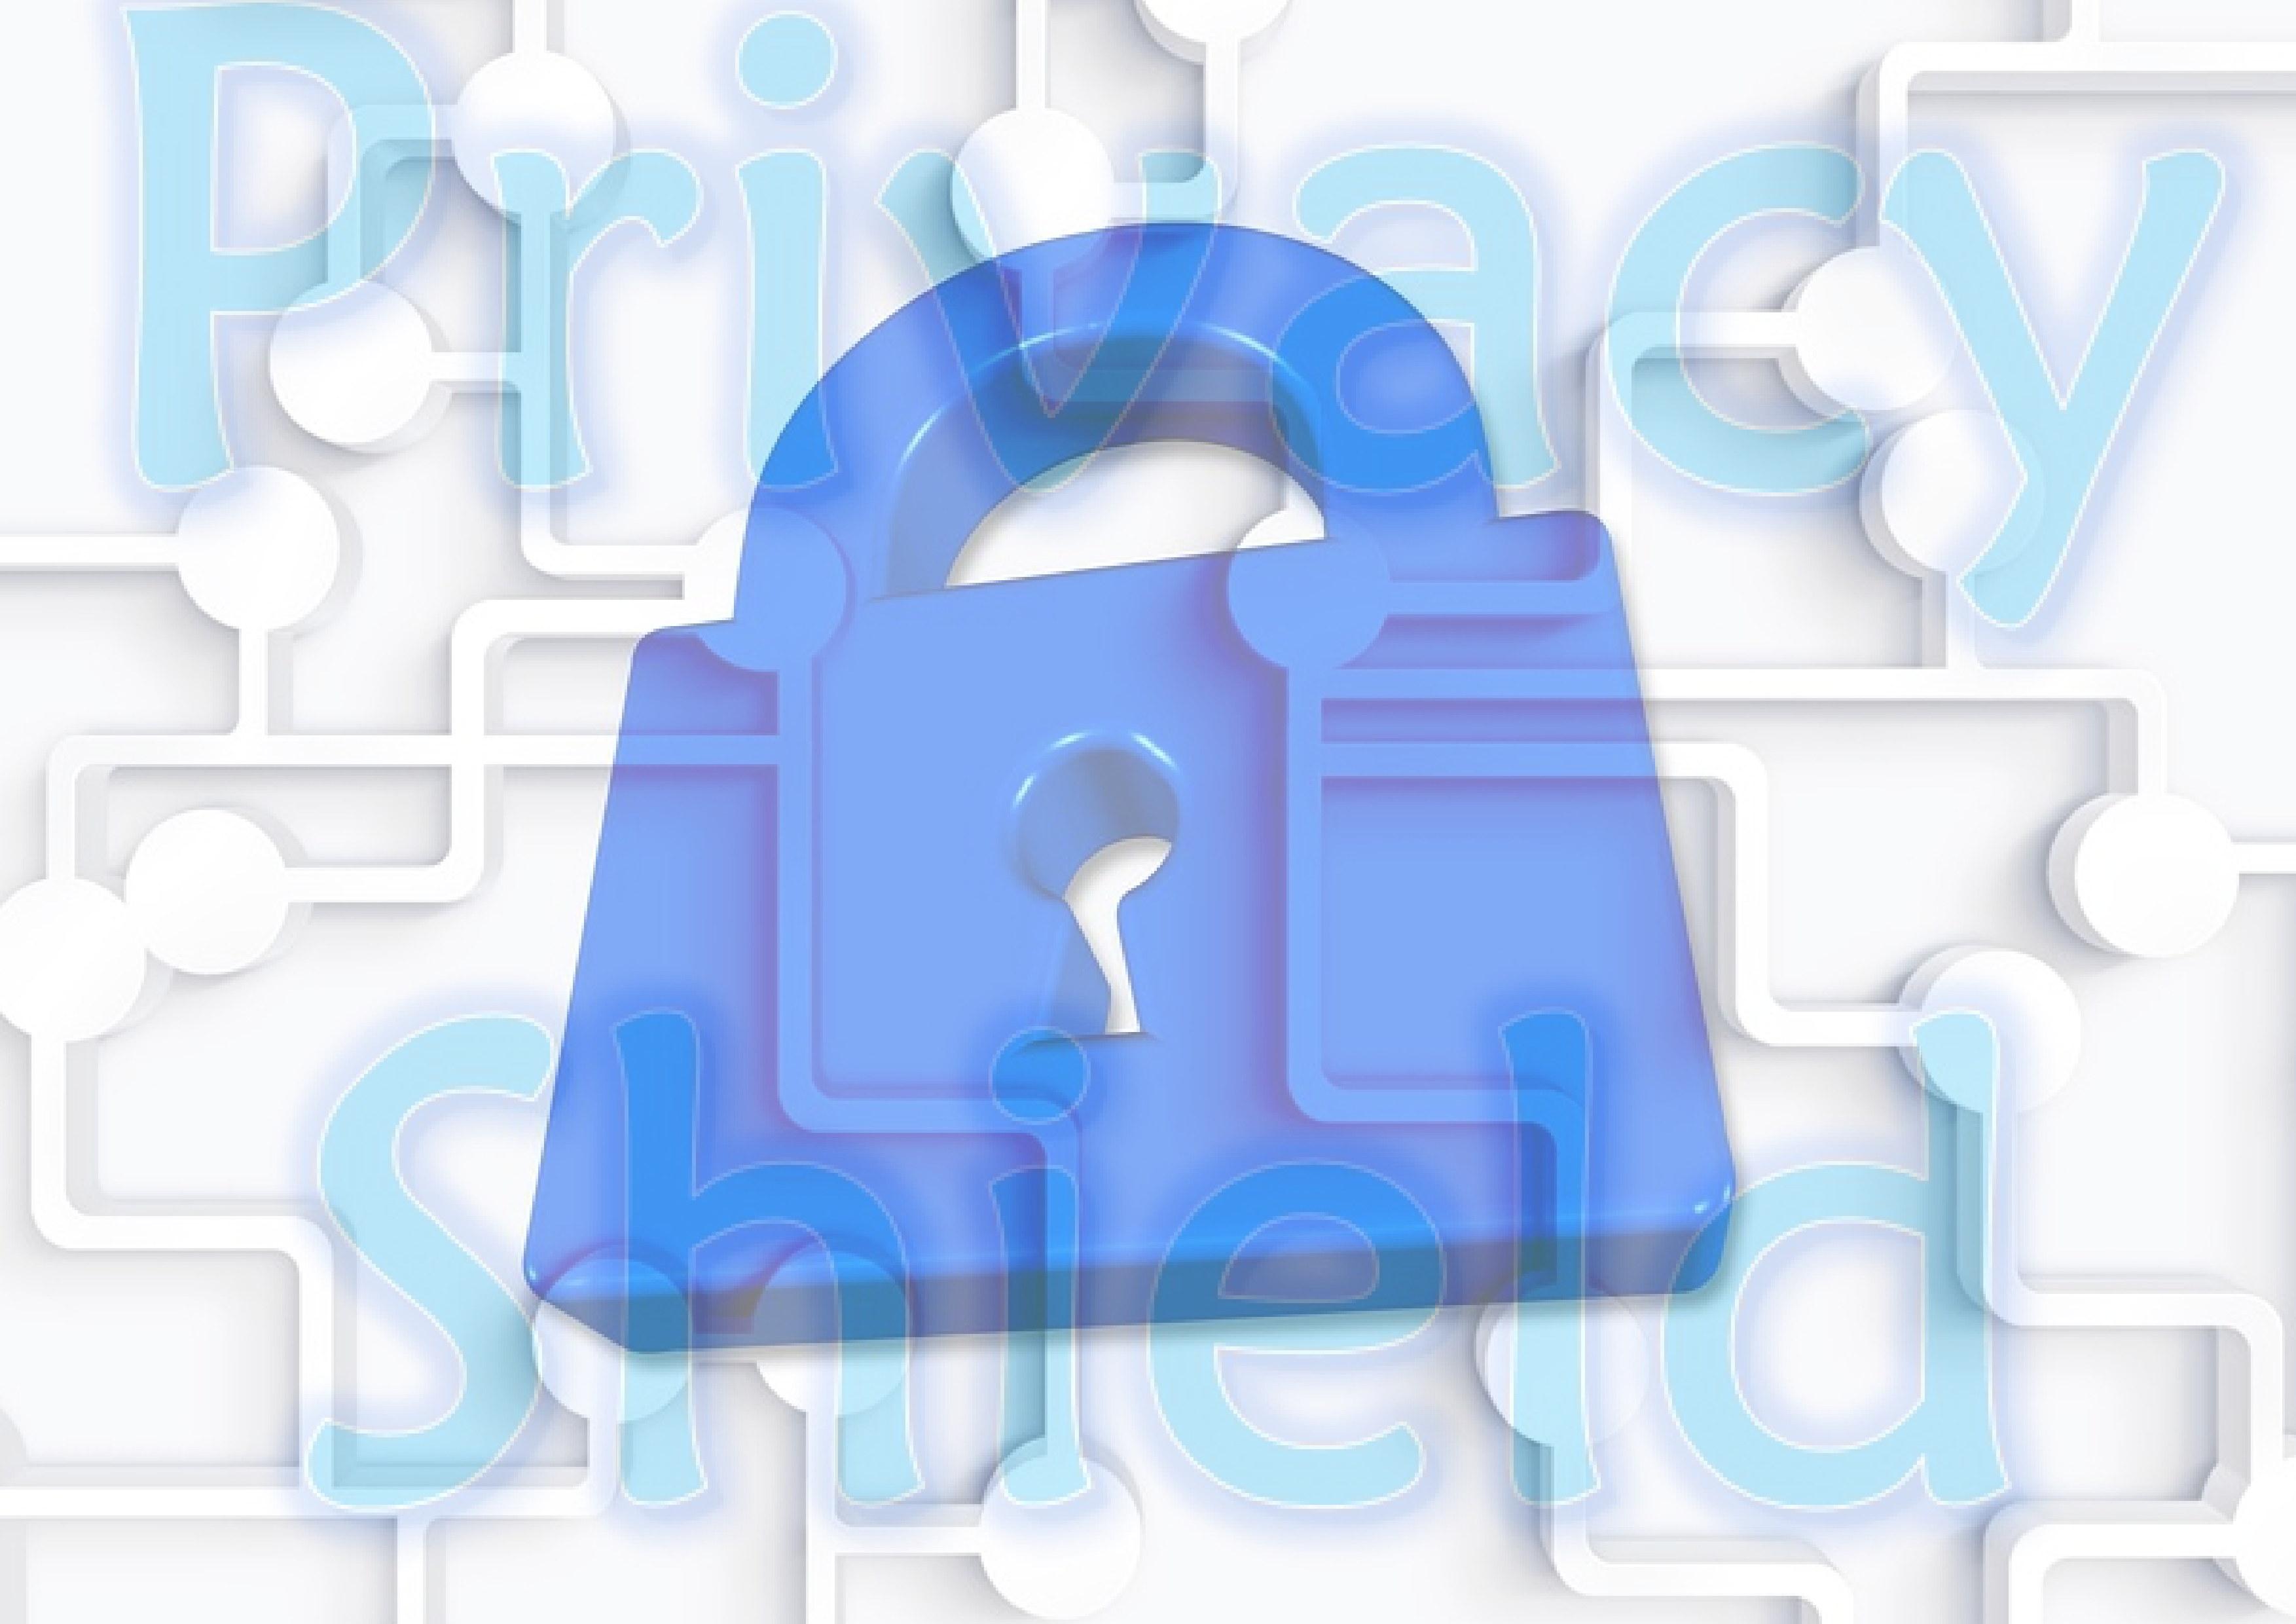 illu (c) aa privacy shield